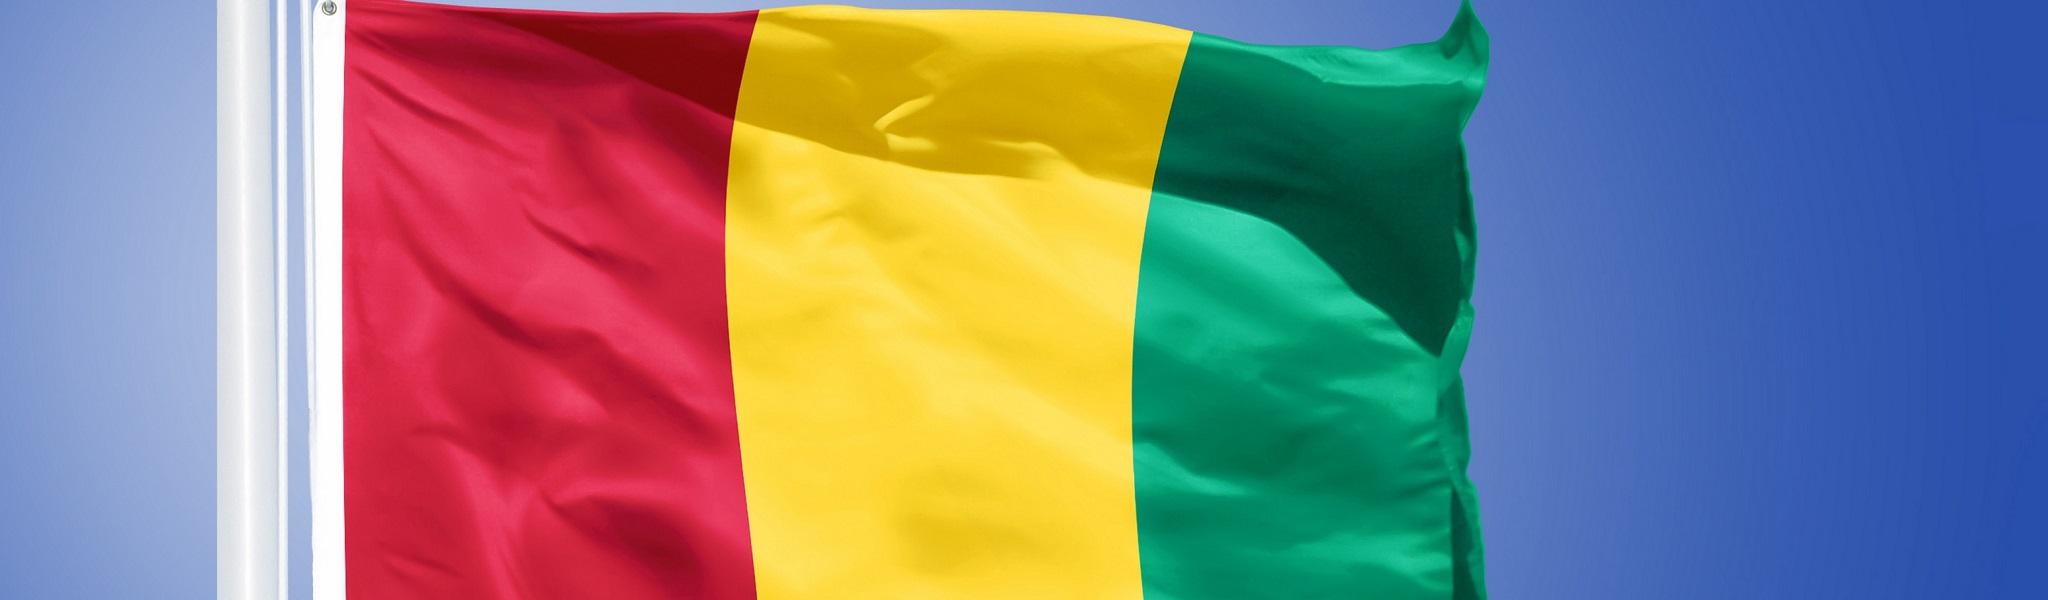 Flag of Guinea flying against a blue sky